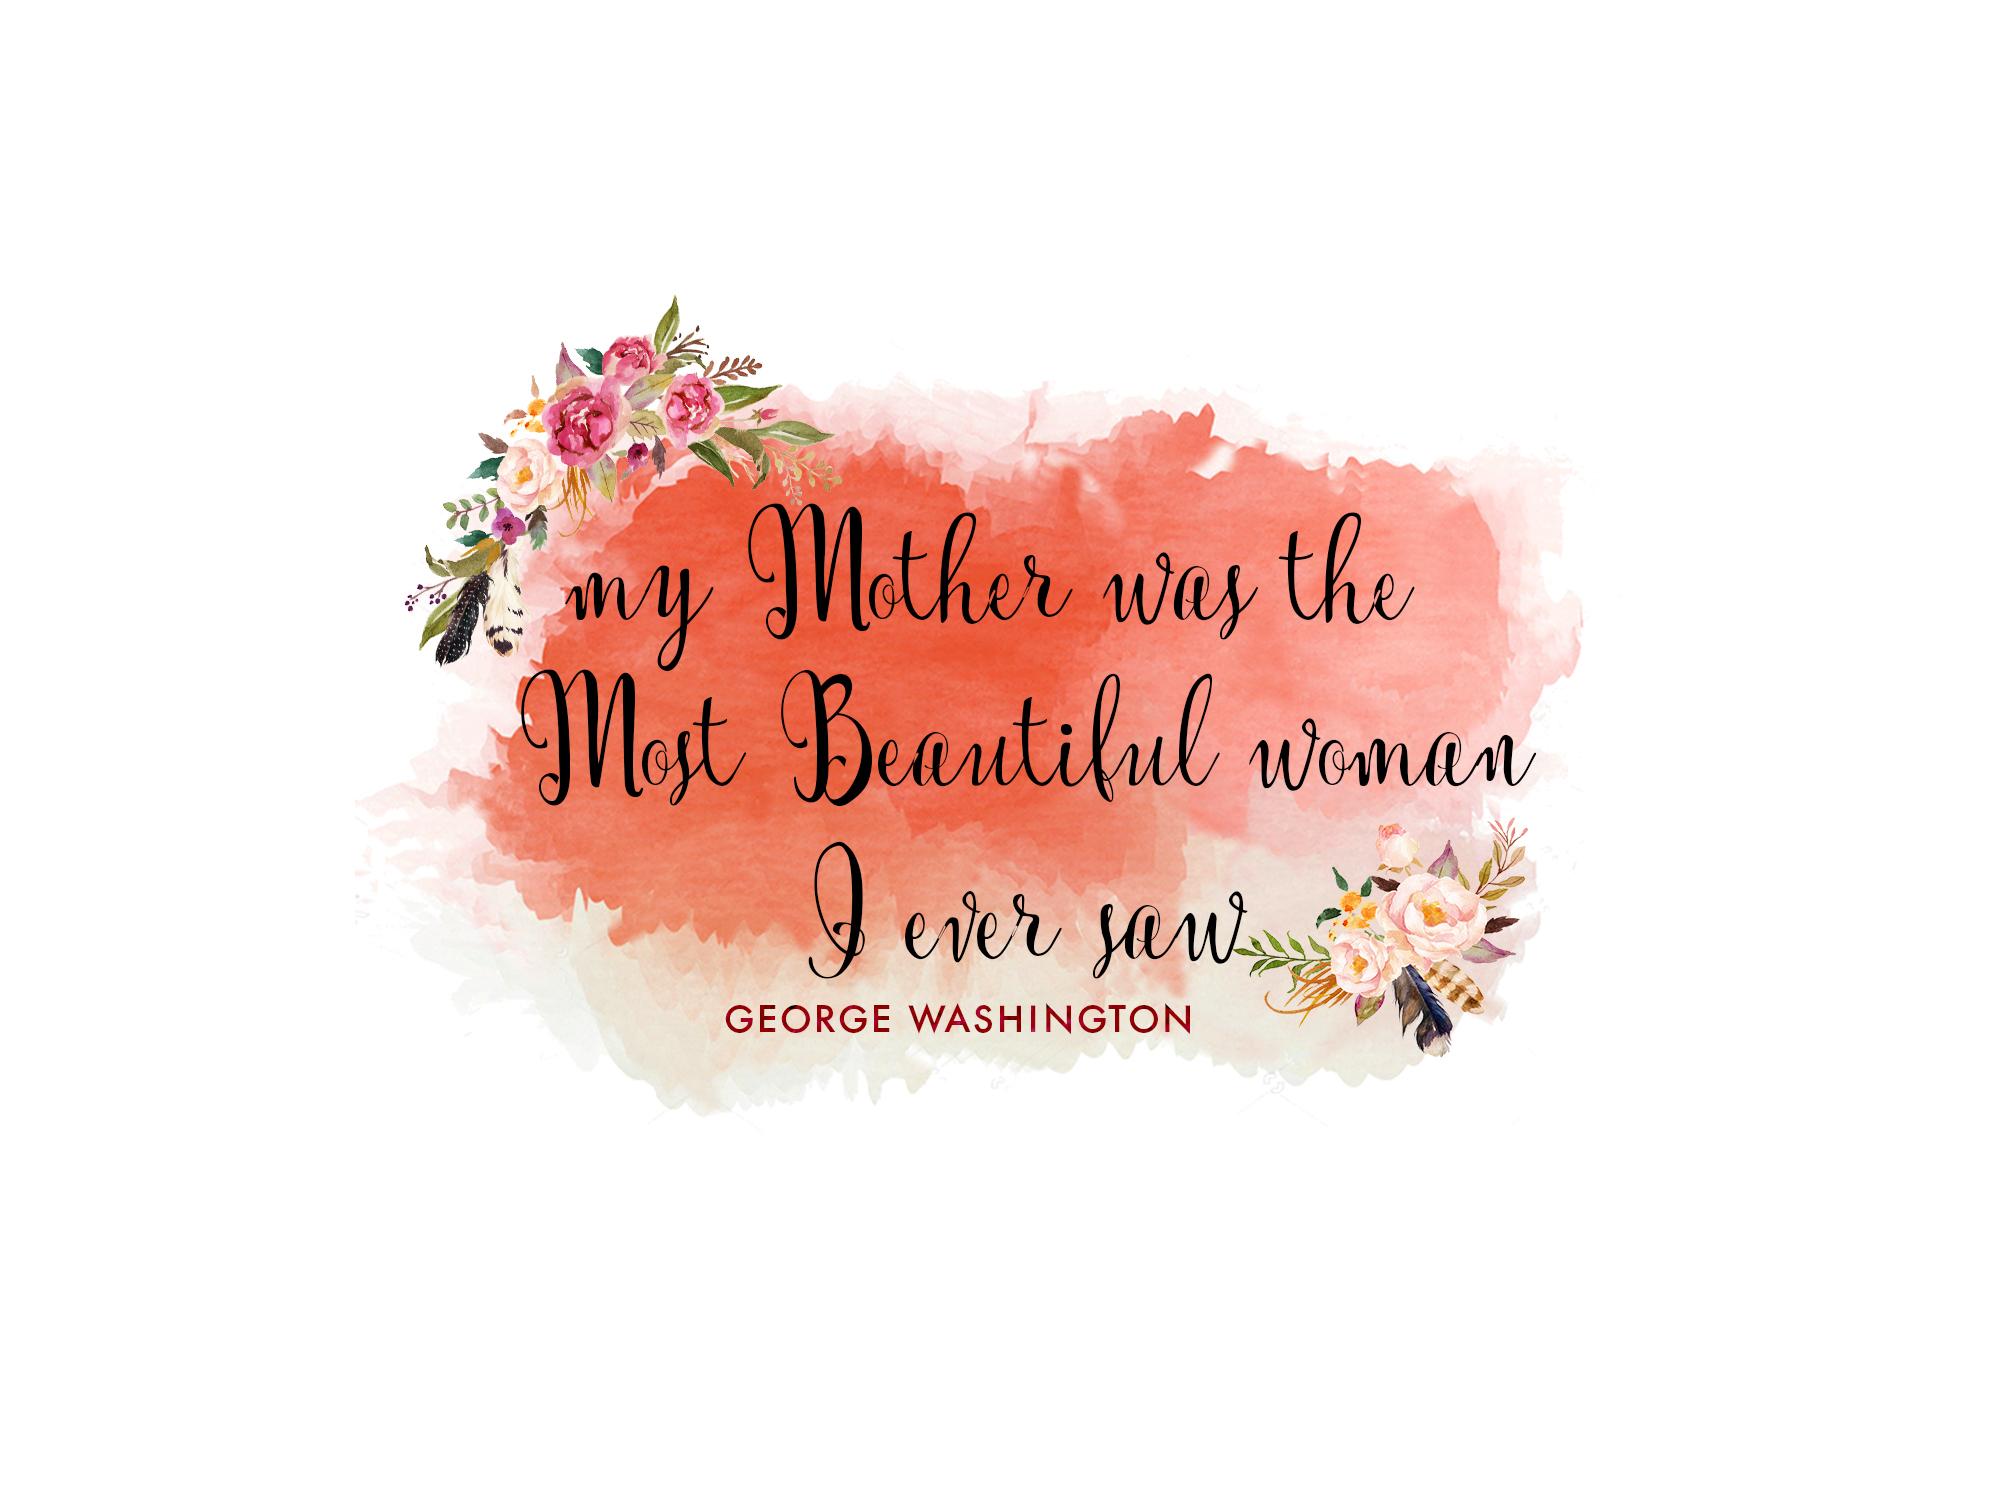 Free Mother's Day Printable George Washington Quote - Free Printable Mothers Day Cards No Download